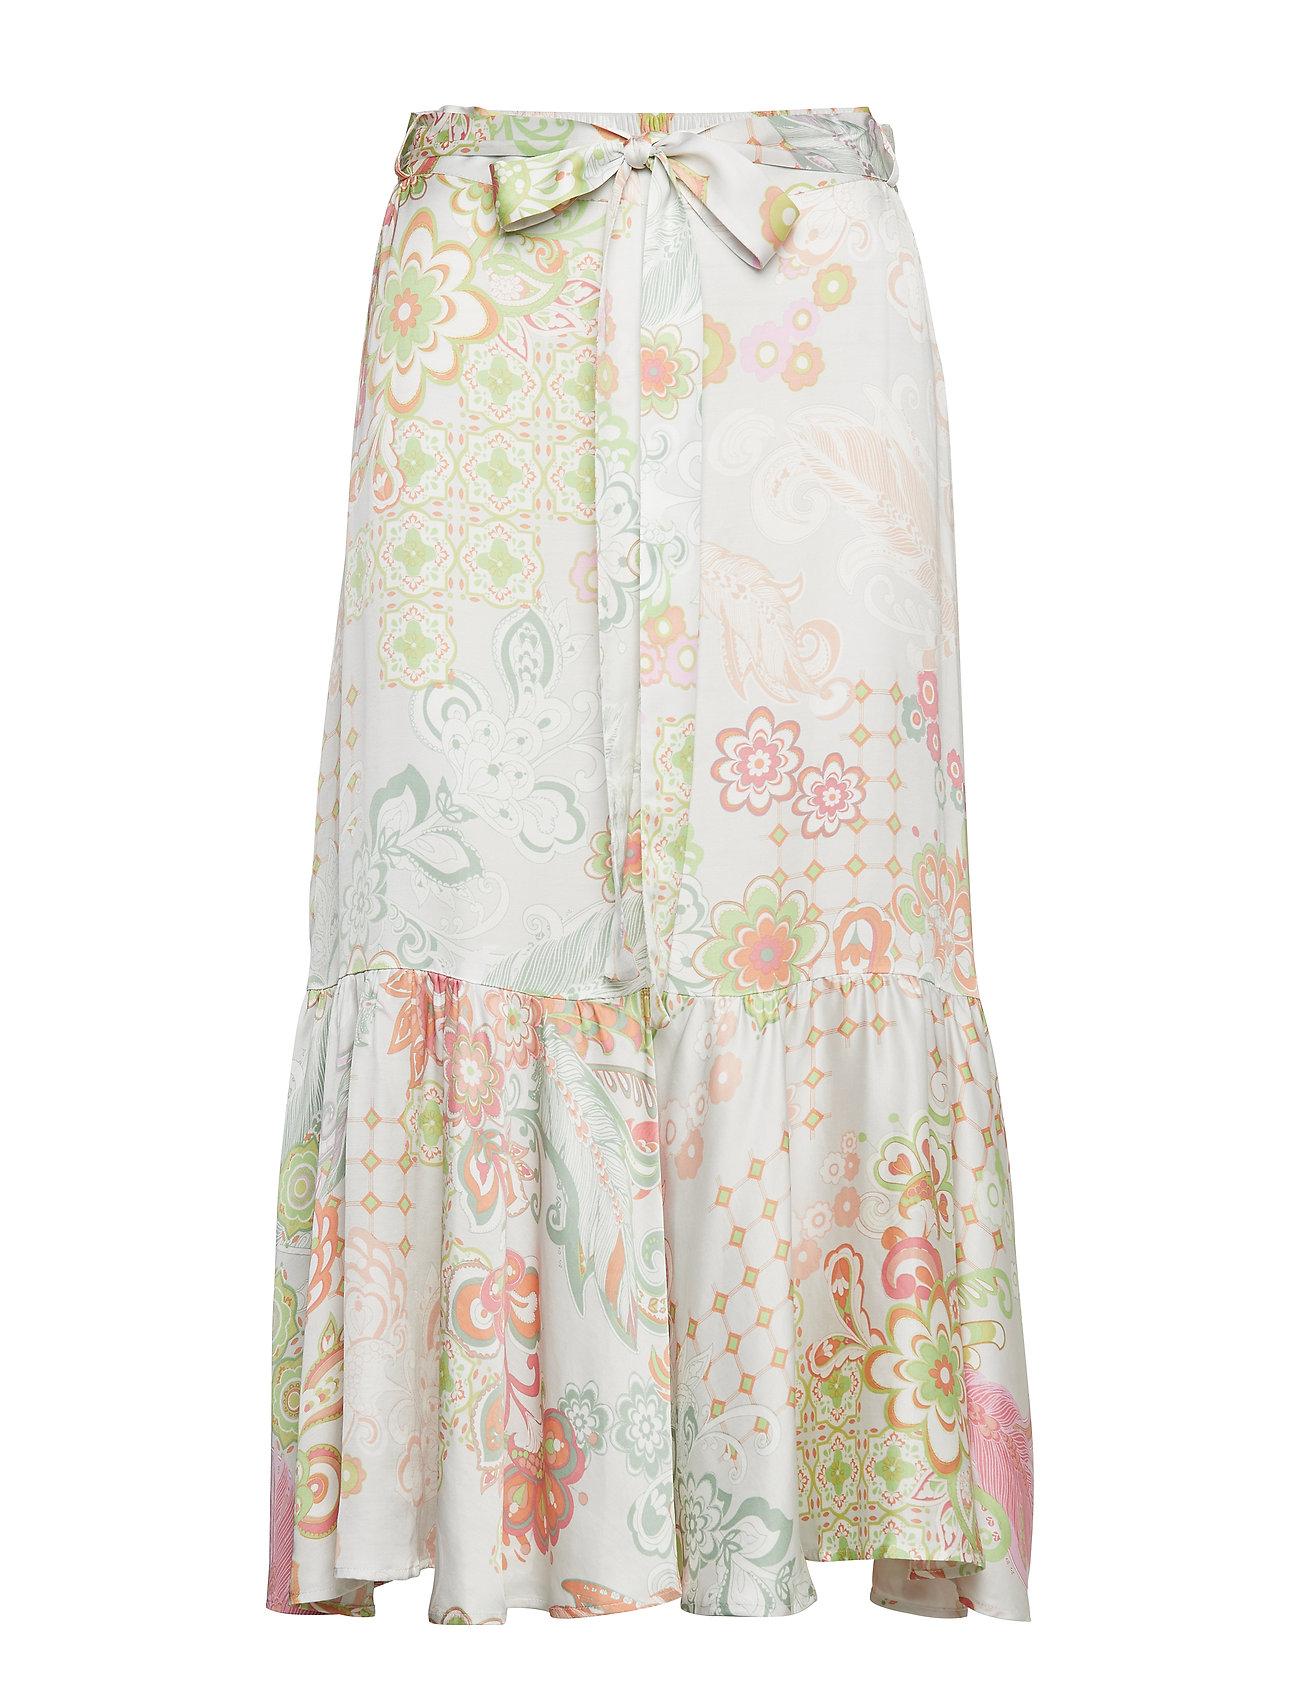 ODD MOLLY wonderland skirt - MULTI